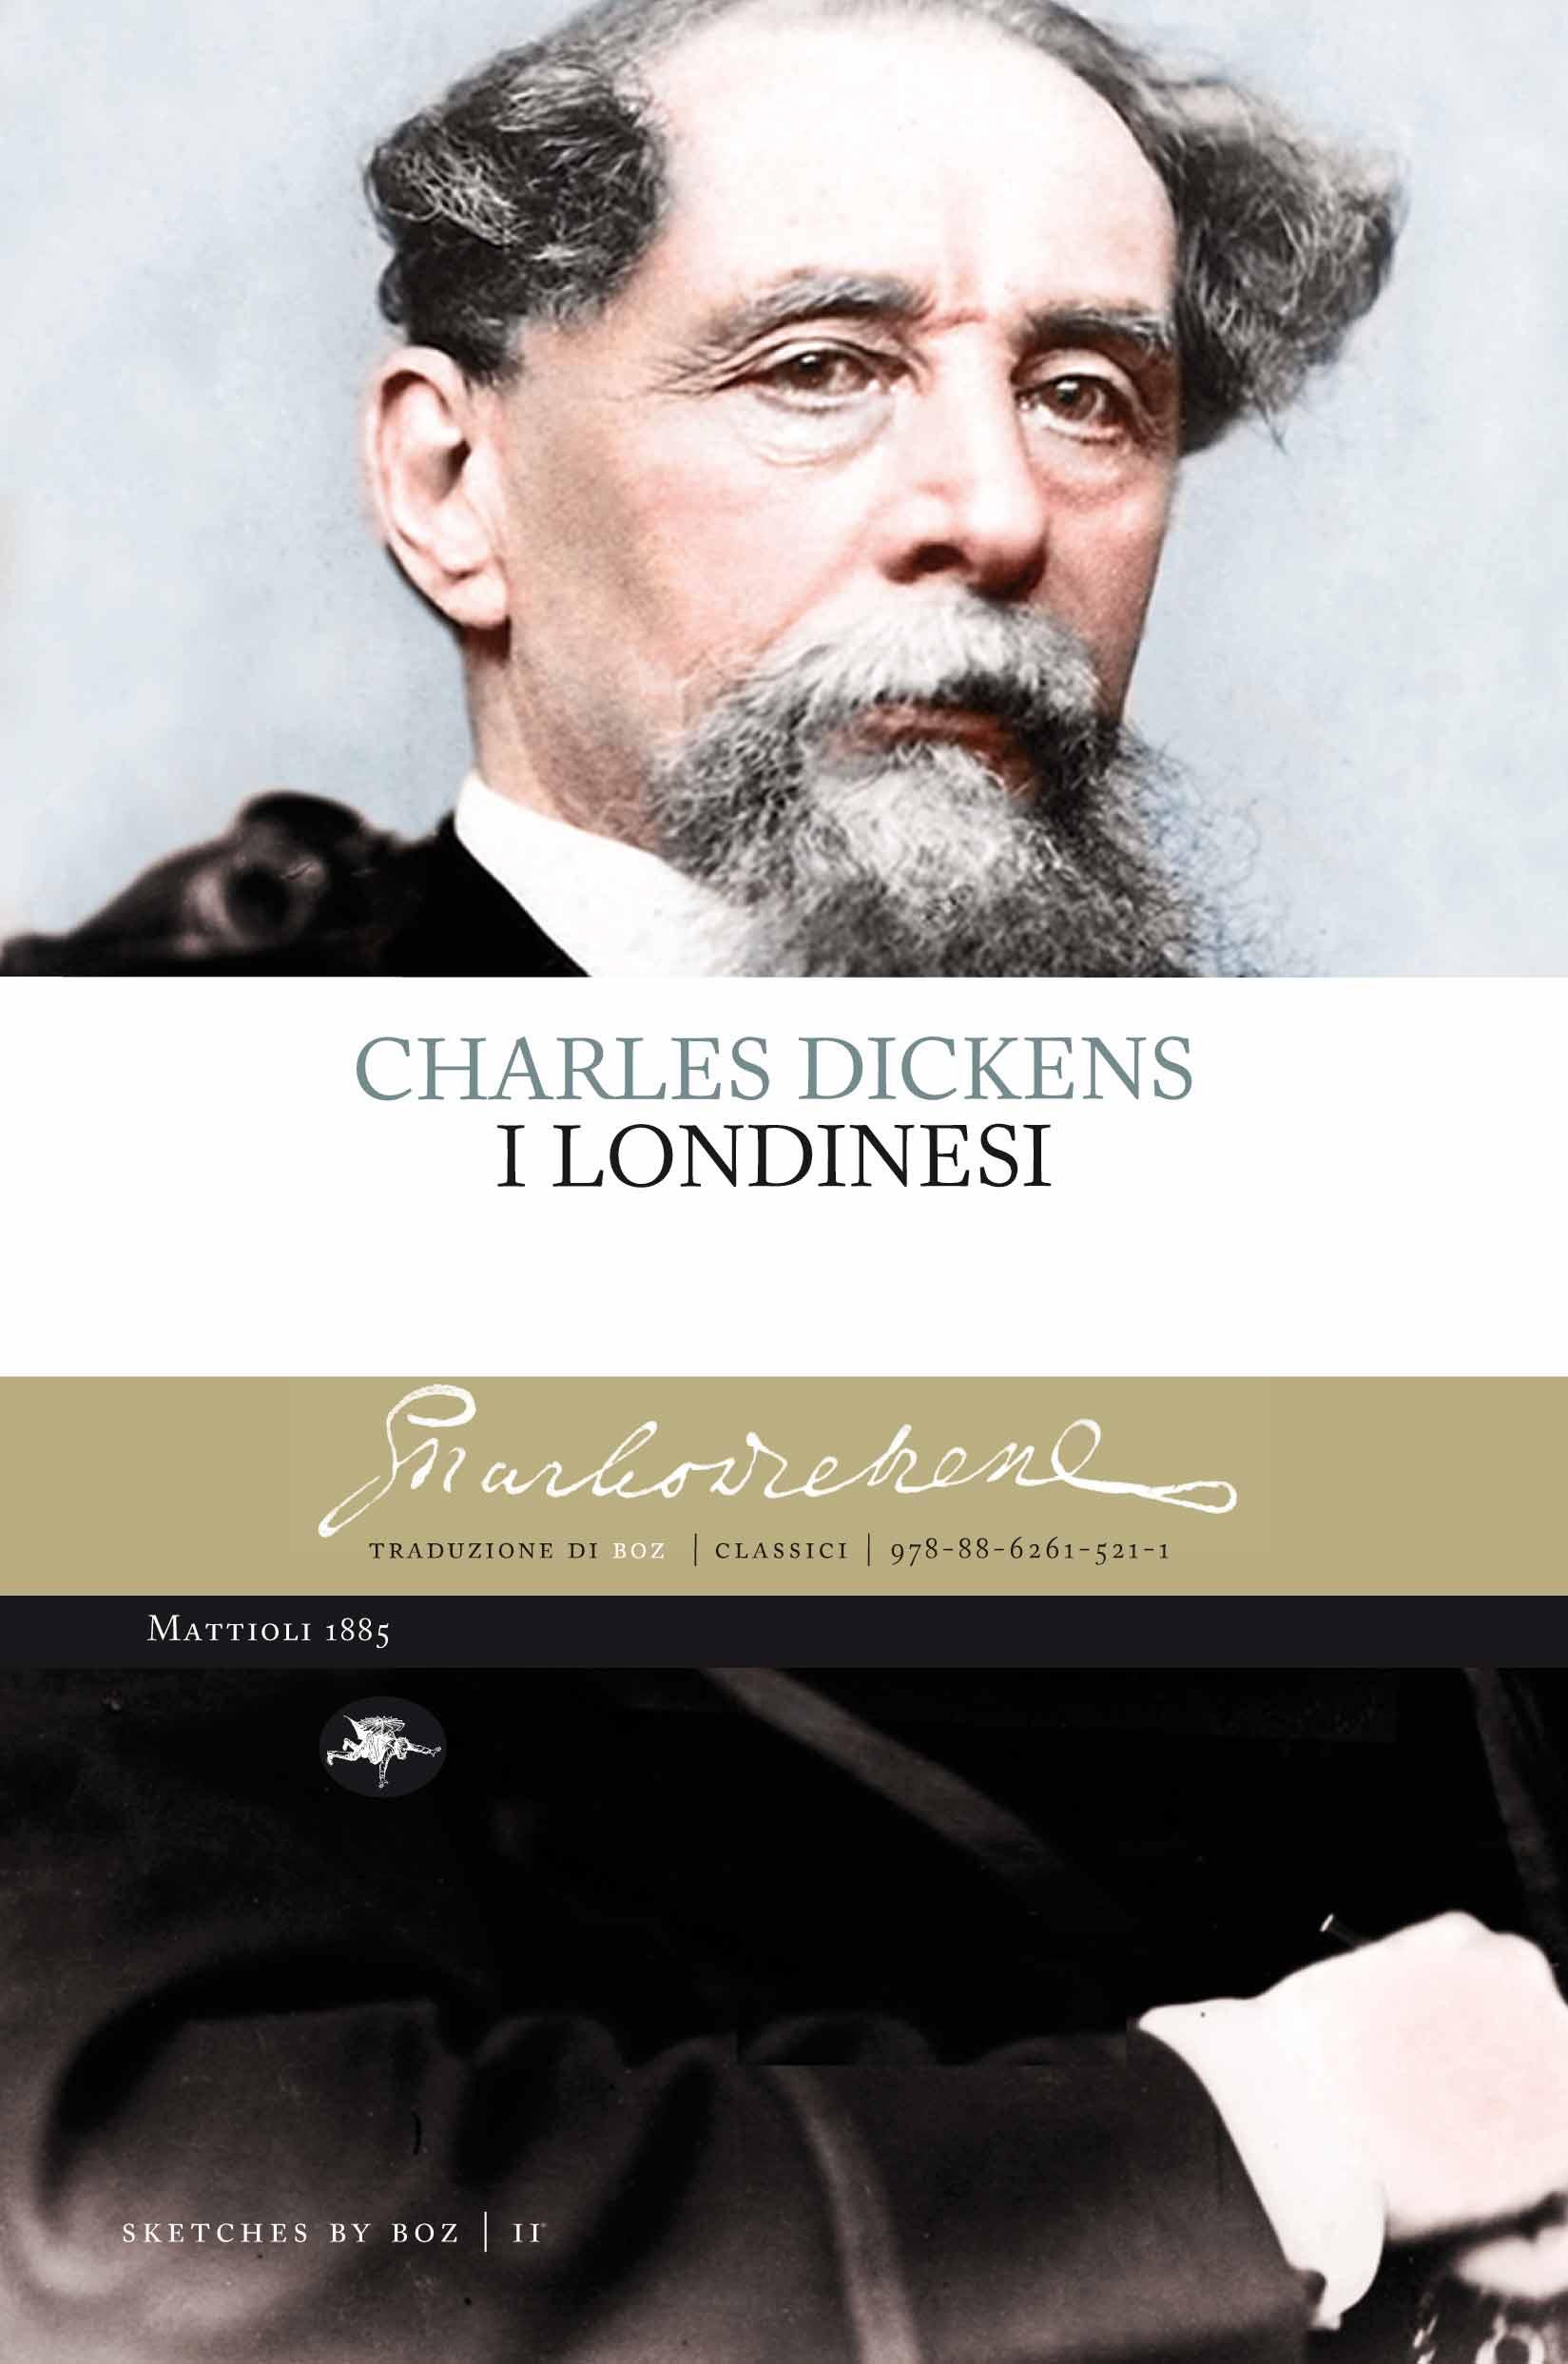 CHARLES_DICKENS_I_LONDINESI